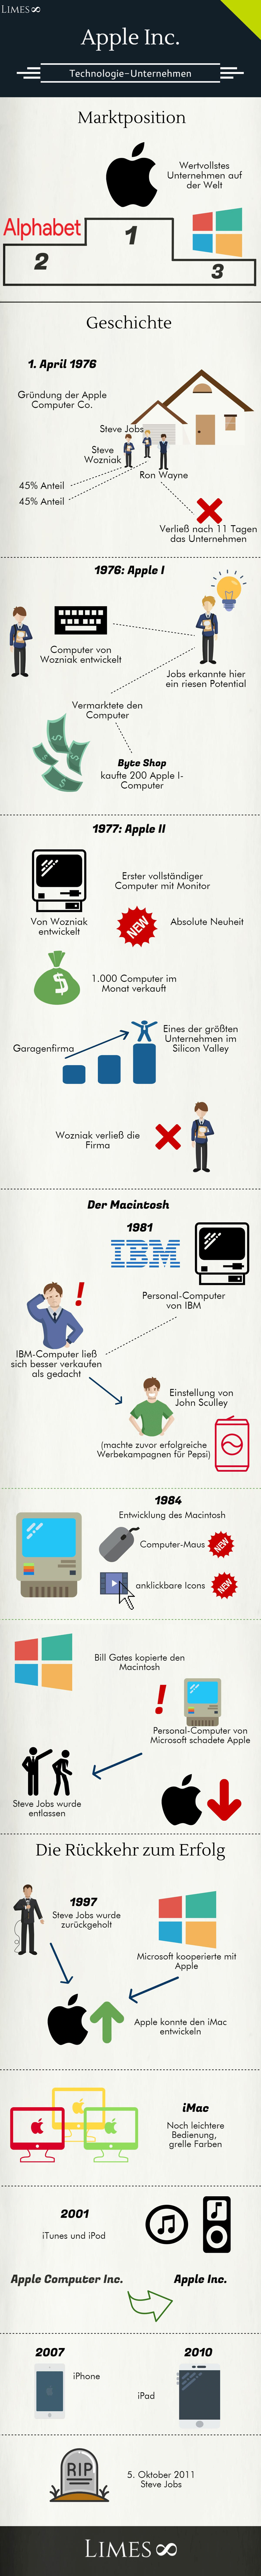 Infografik über die Apple Inc.